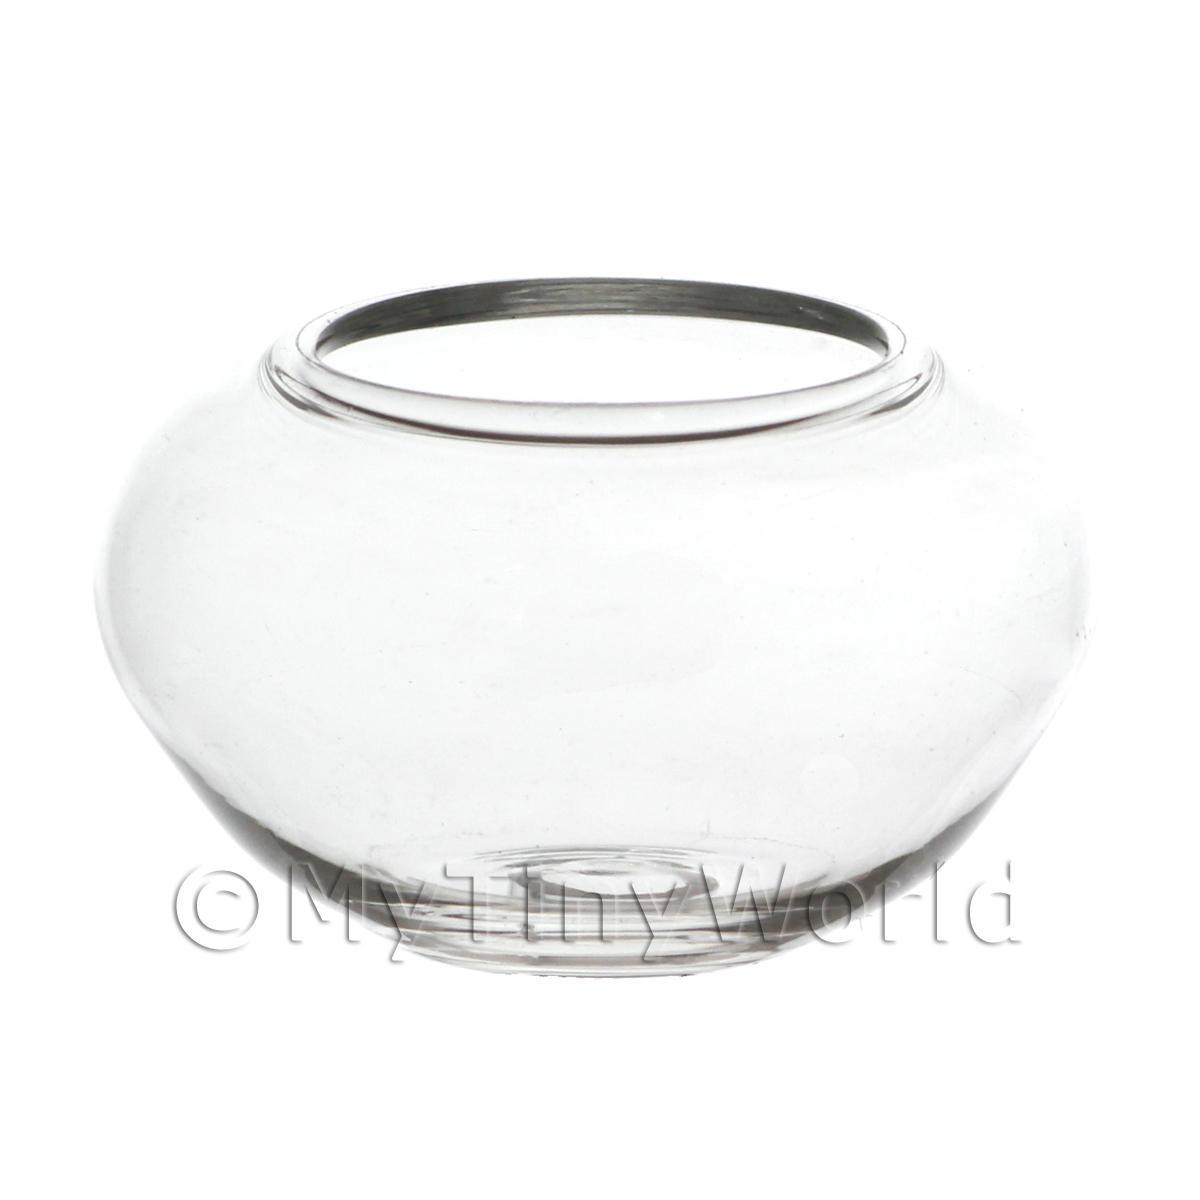 Dolls house miniature glassware dolls house miniature for Large glass fish bowl